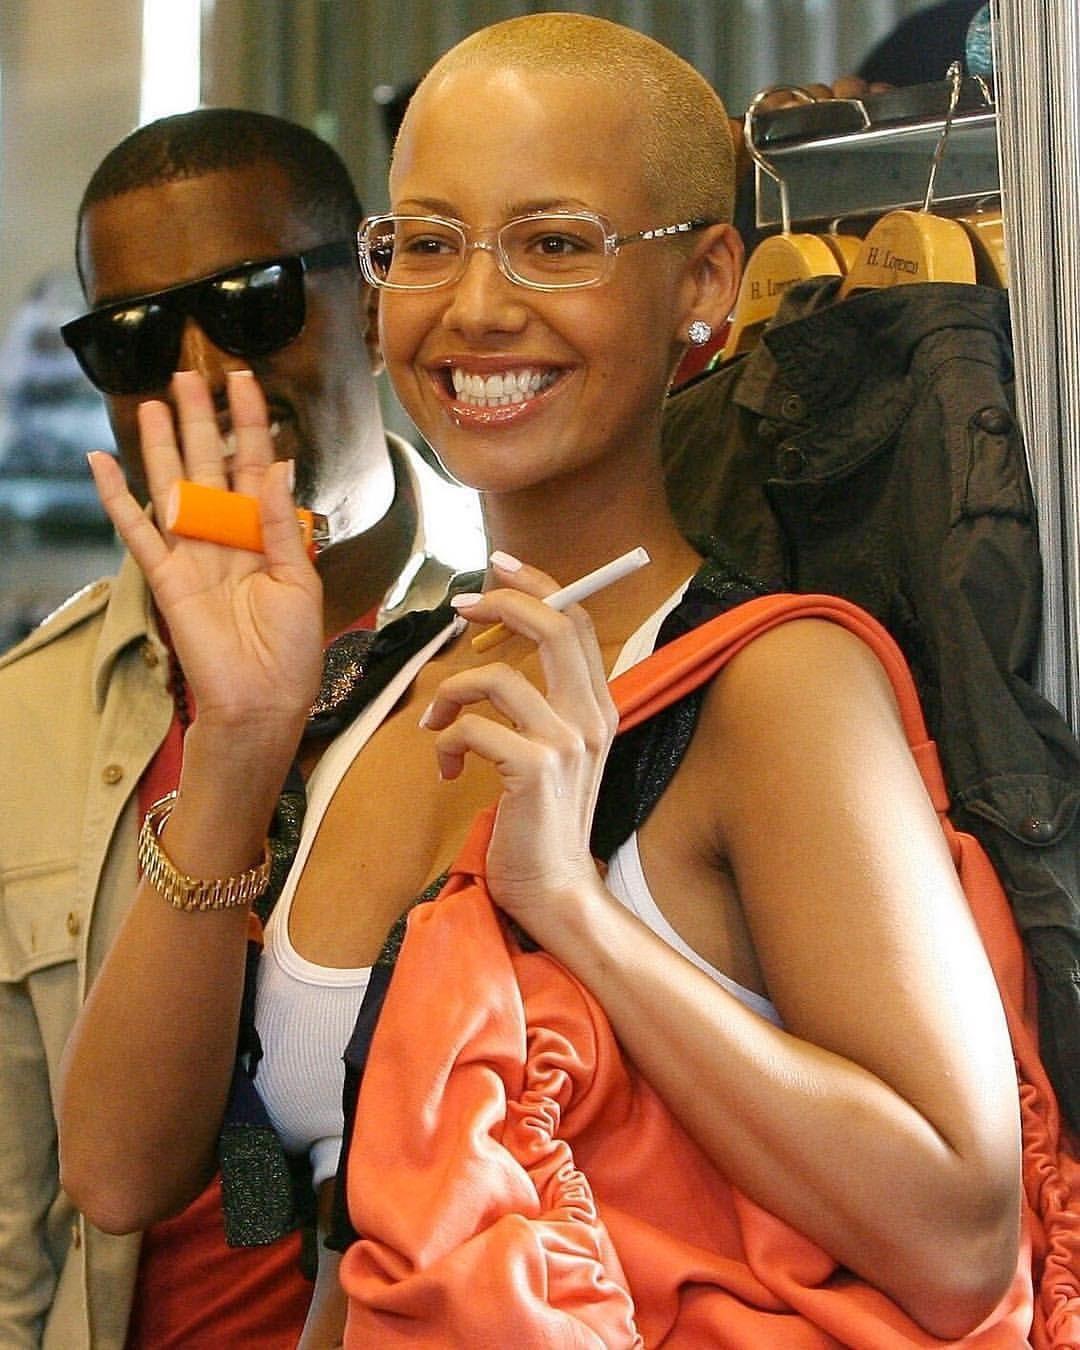 2000s On Instagram Kanye Amber 00s Kanyewest Amberrose Amber Rose Boss Lady People